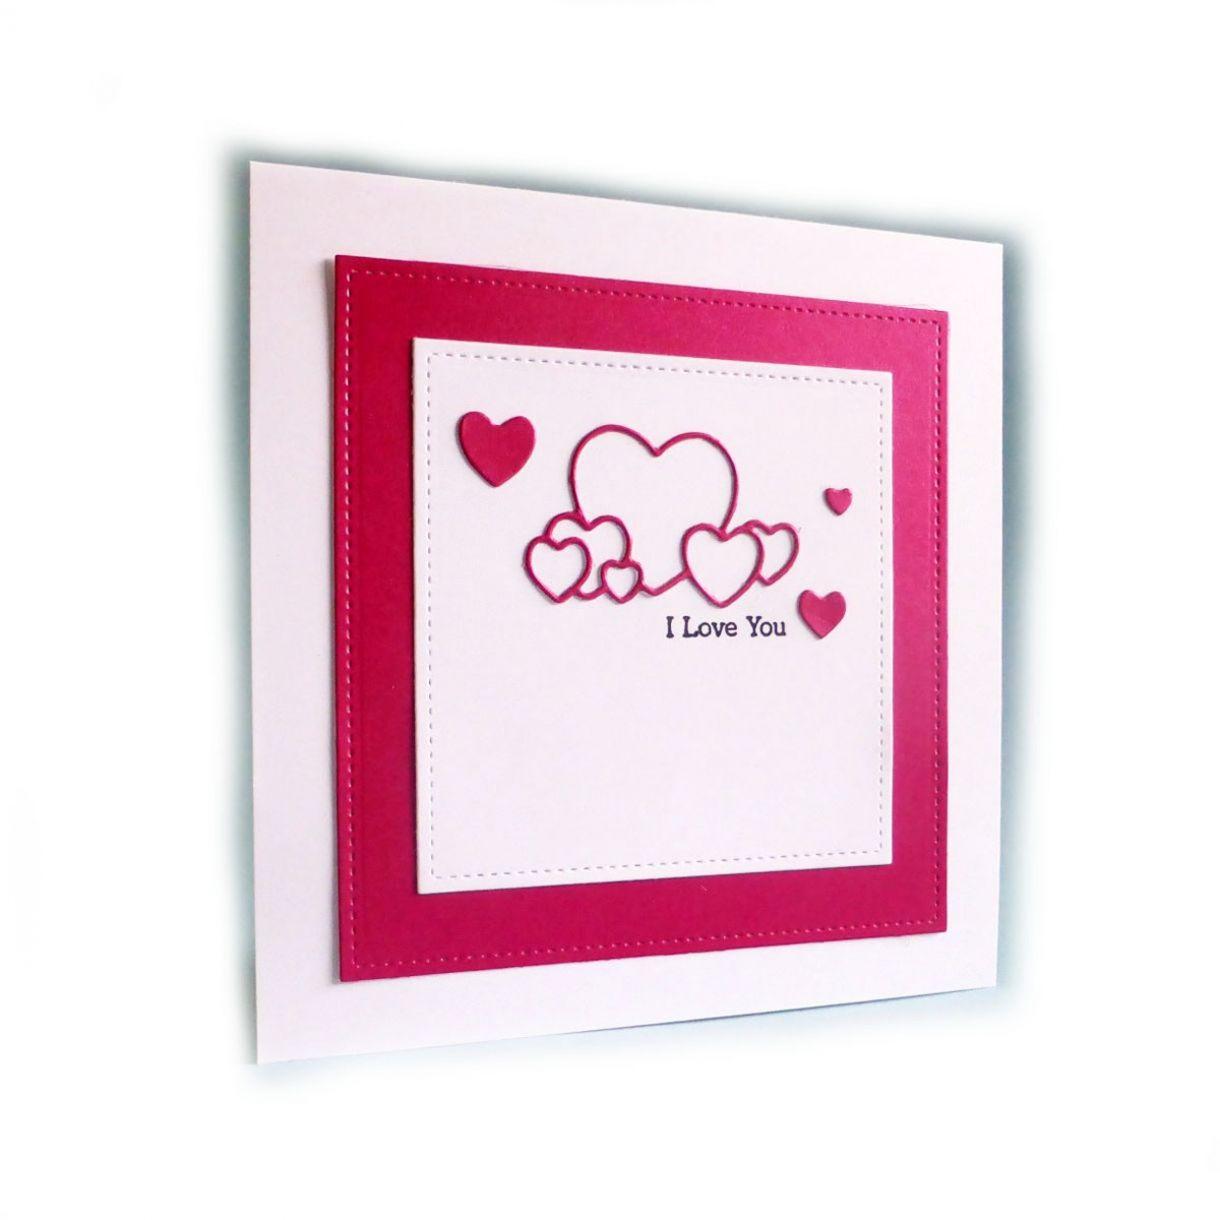 Jane Valentine Cas Card 1 C870804Eb5Dd0D440545727Fd8680E78